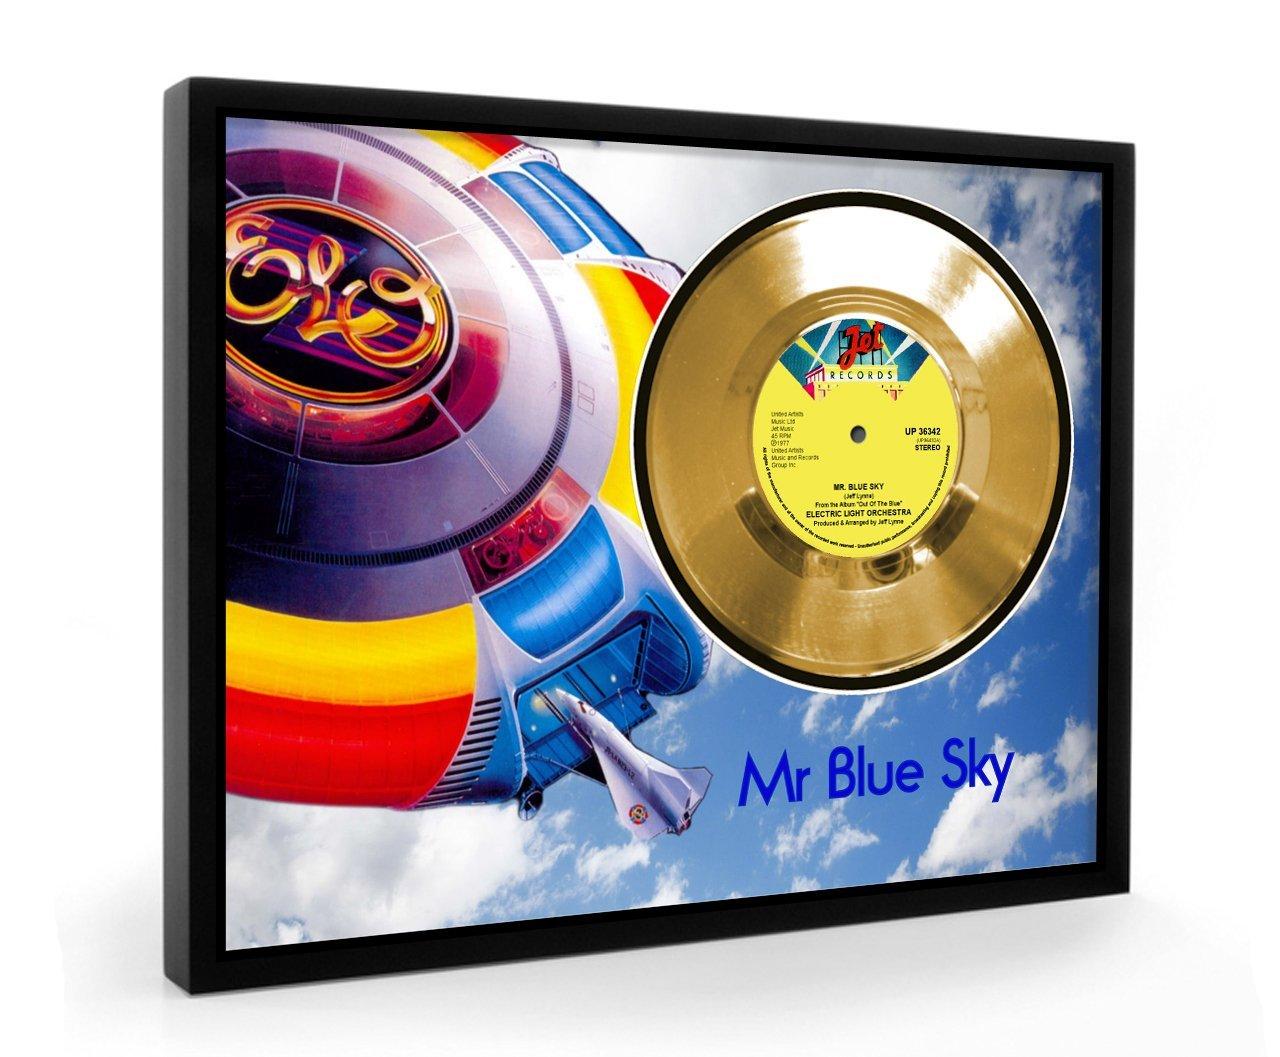 Elo Mr Blue Sky Framed Gold Disc Display Vinyl (C1) CGD